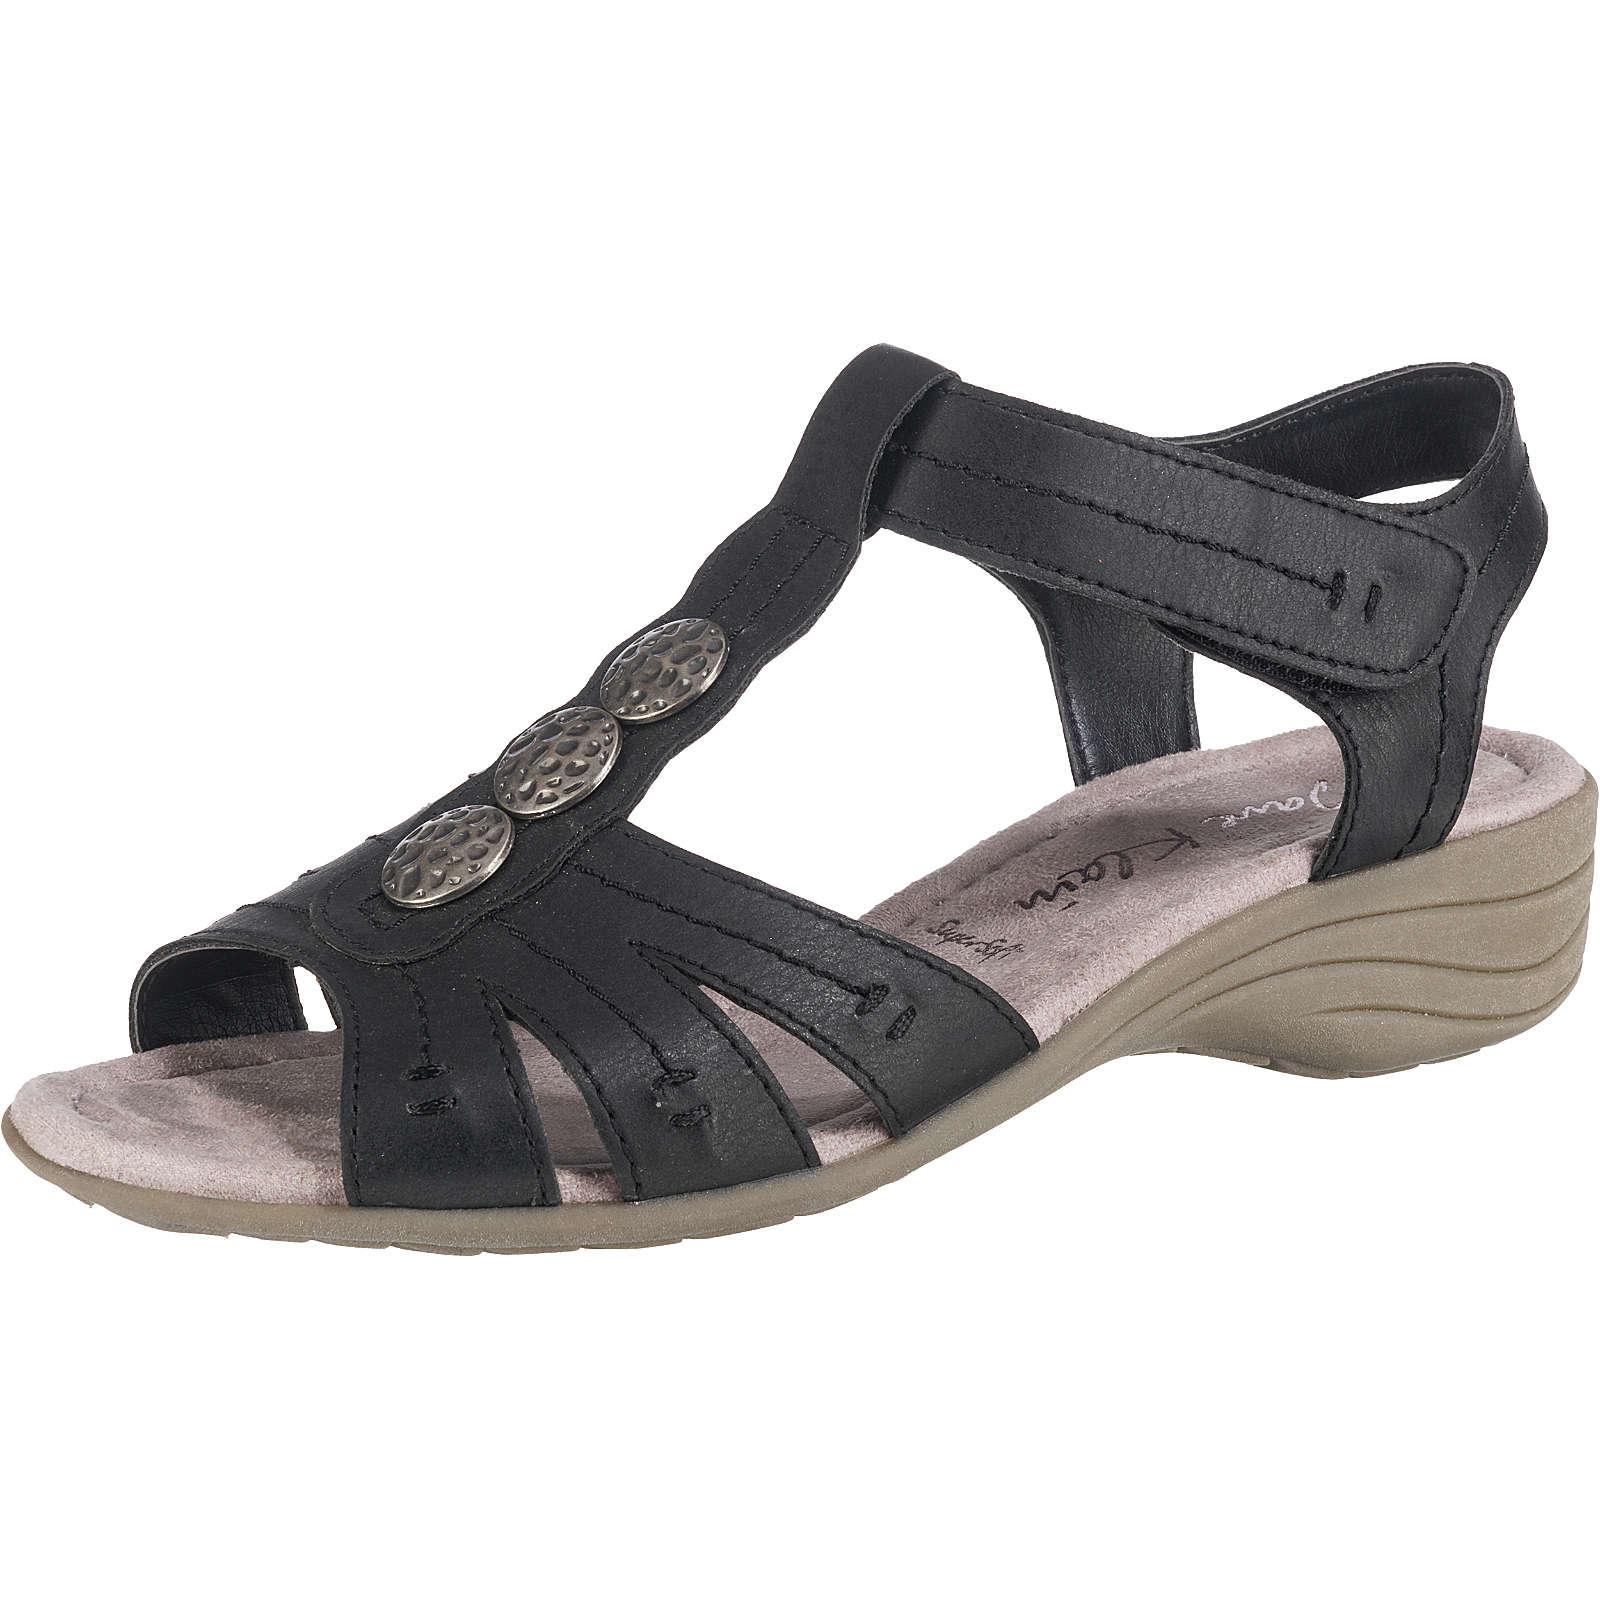 Jane Klain T-Steg-Sandaletten schwarz Damen Gr. 40